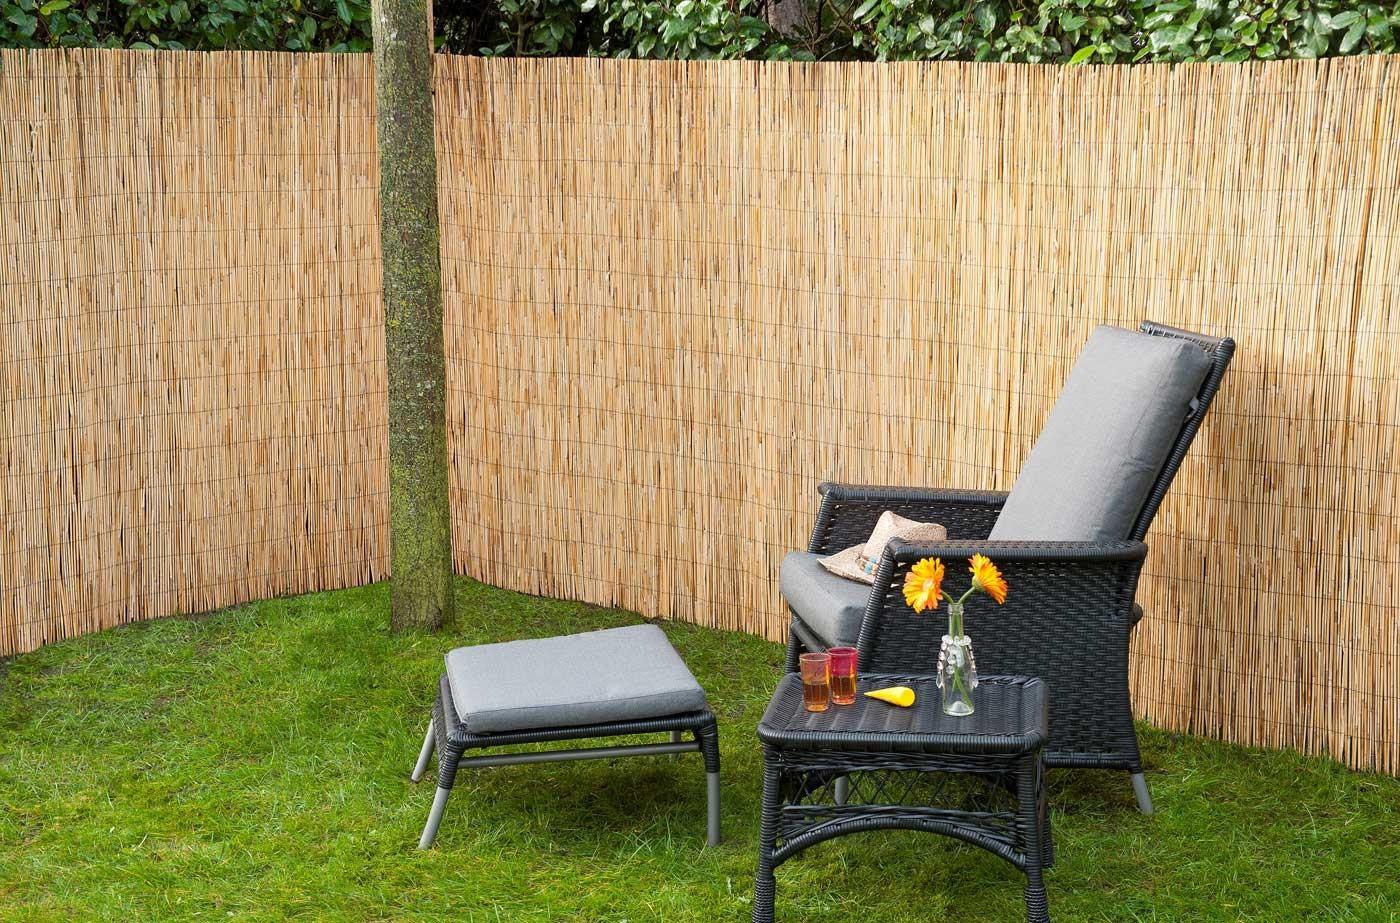 Brise vue canisse de jardin en roseau naturel 500 x 150 cm - Vue de jardin ...